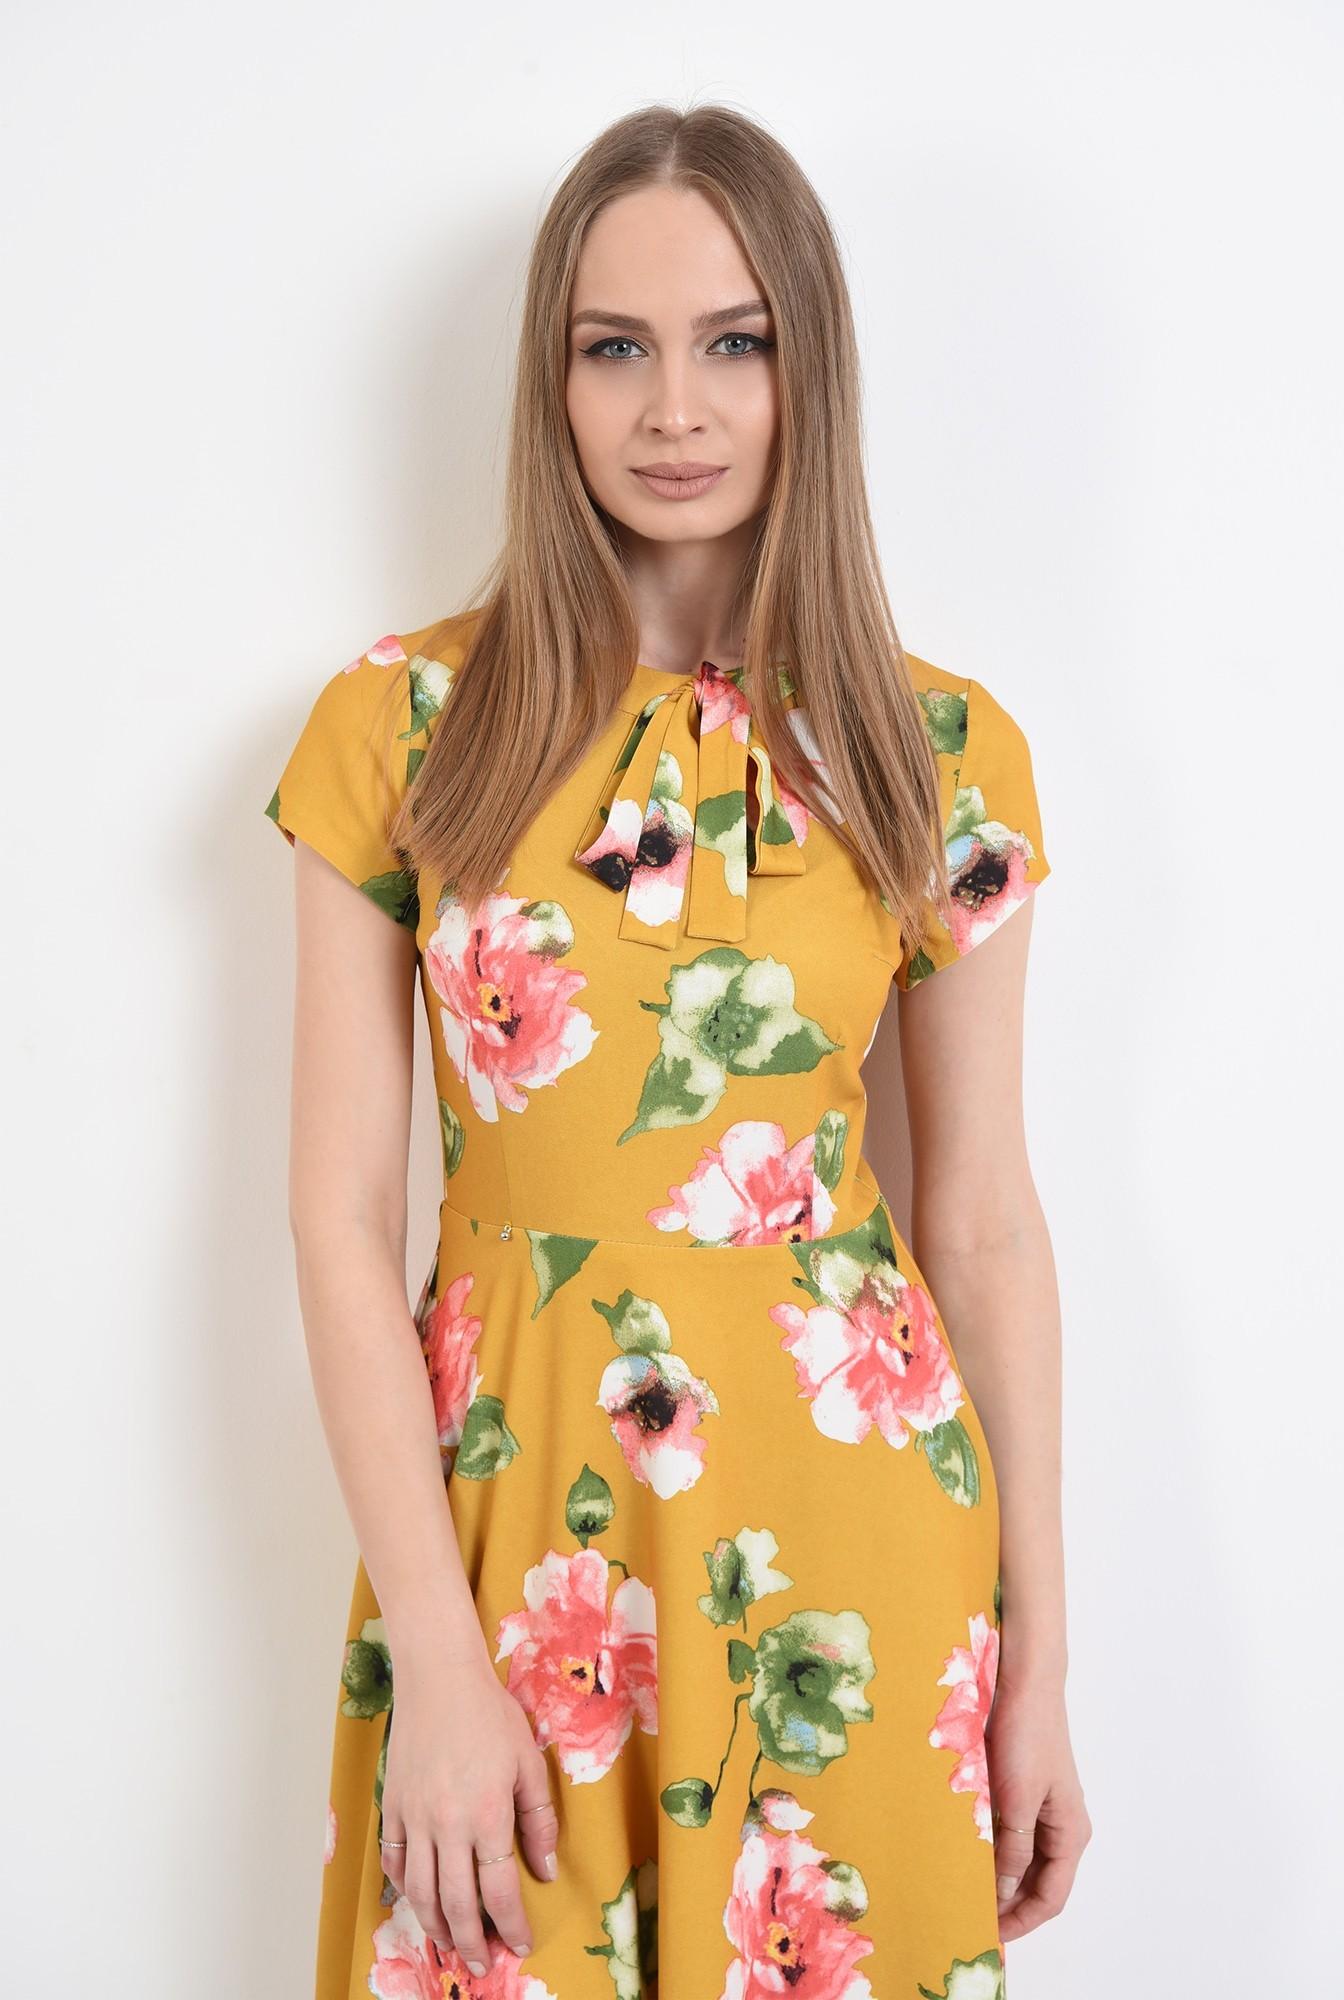 2 - 360 - rochie de primavara, midi, evazata, cu imprimeu floral, Poema